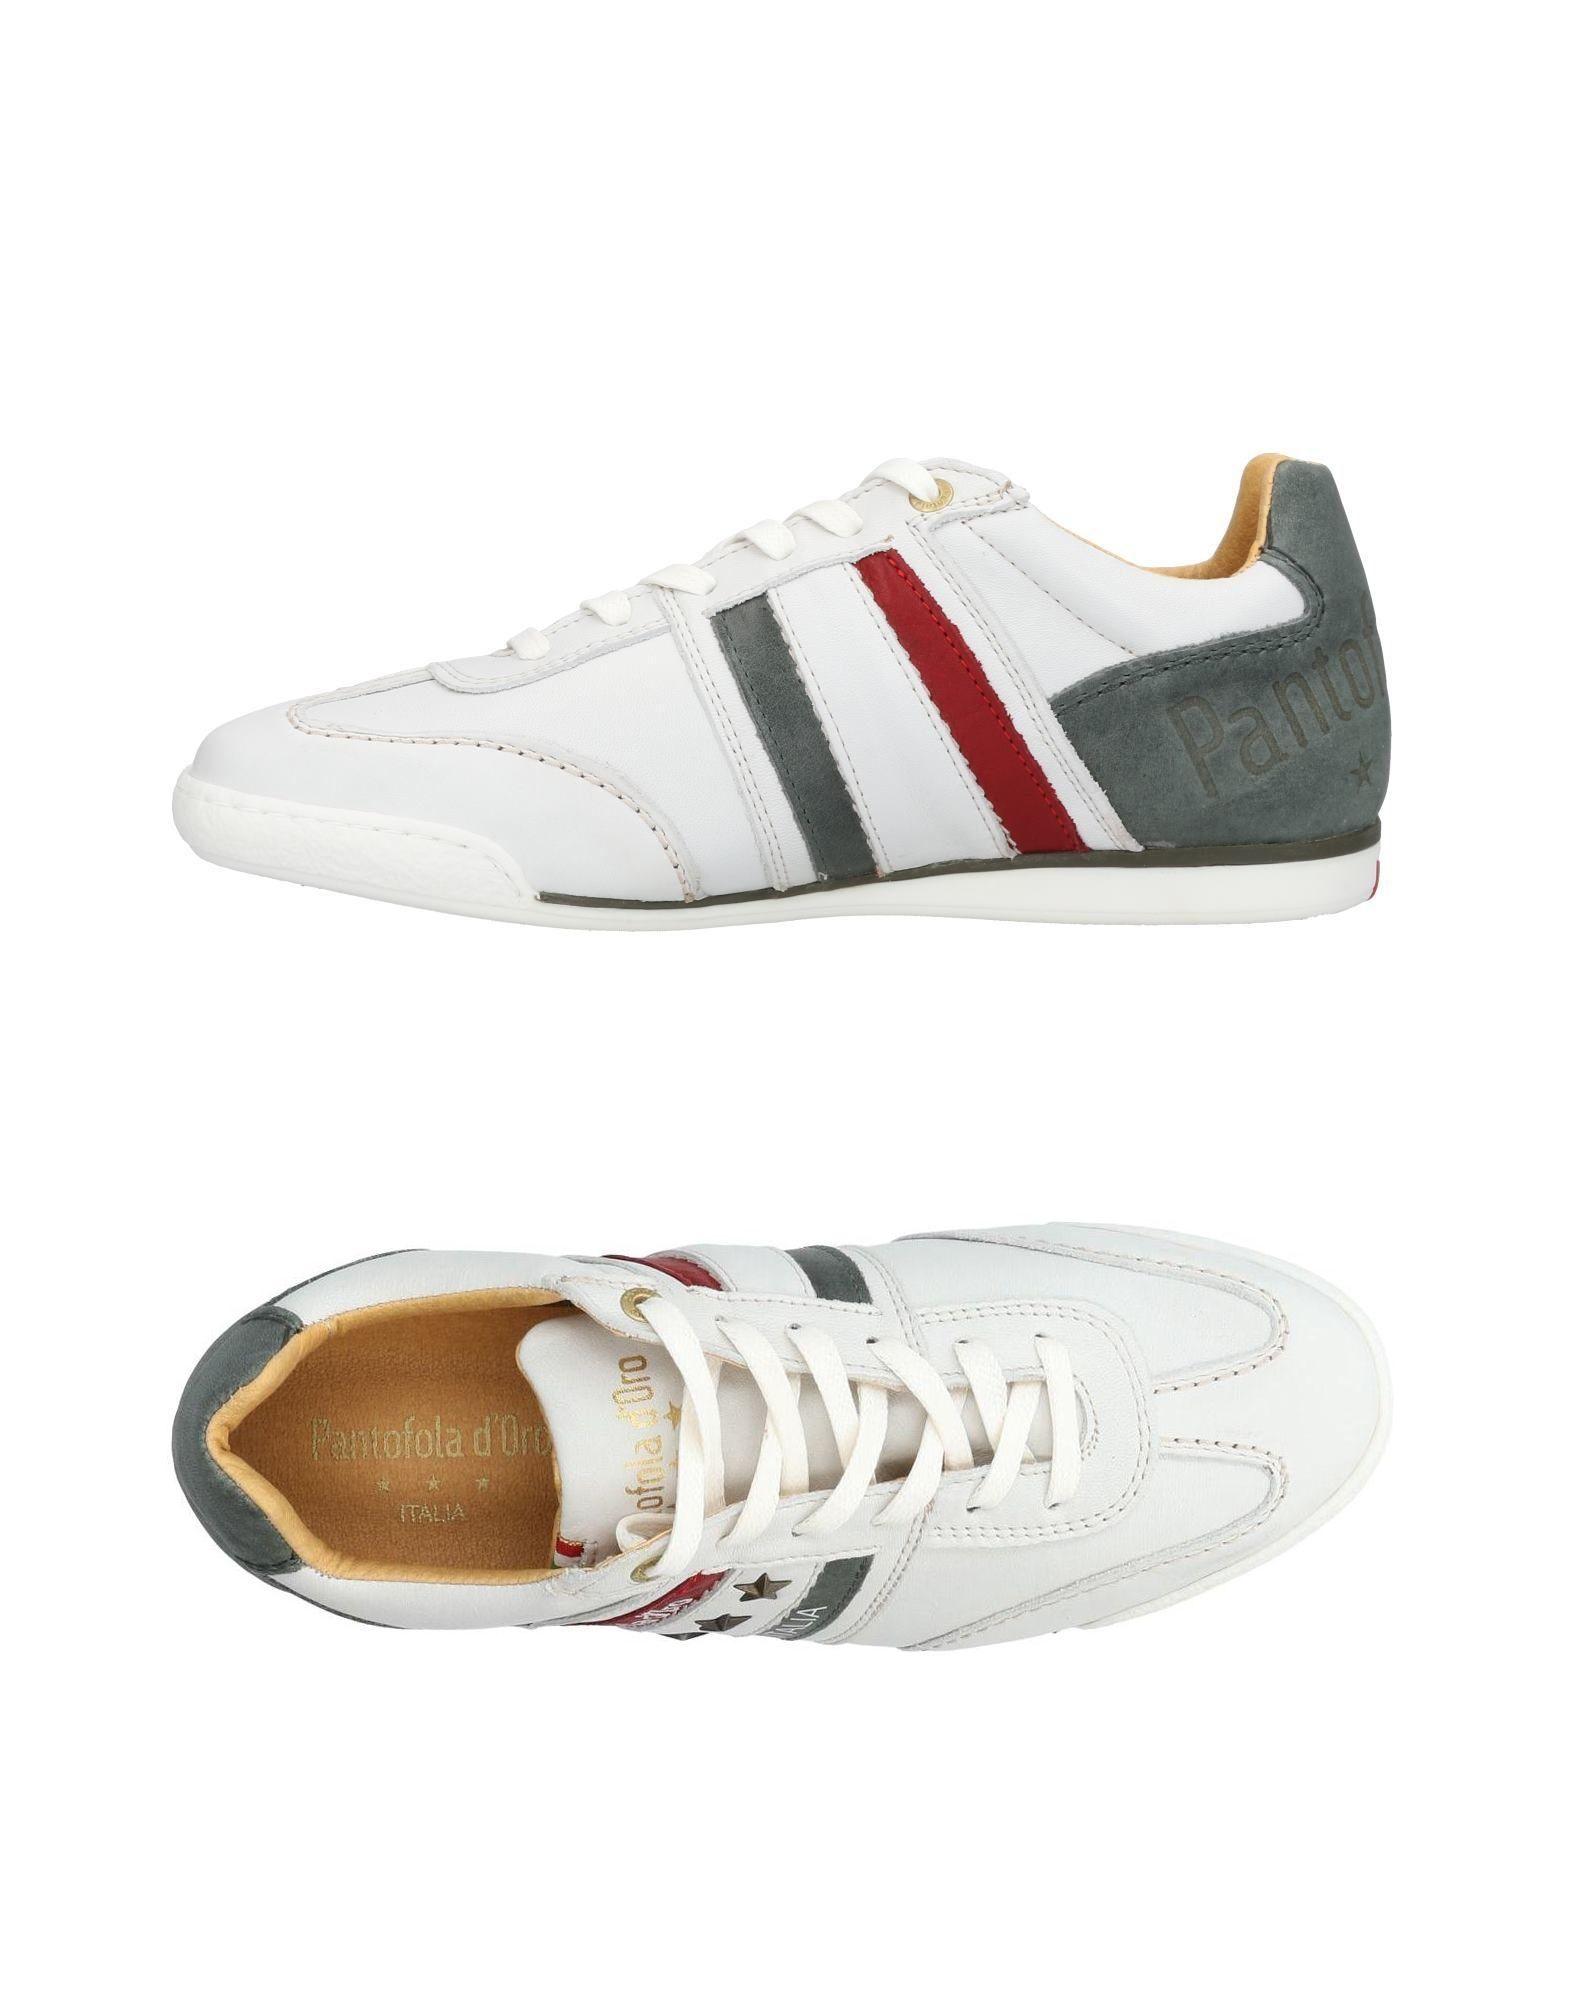 Pantofola D'oro Sneakers Herren Gutes Preis-Leistungs-Verhältnis, es lohnt sich 21039